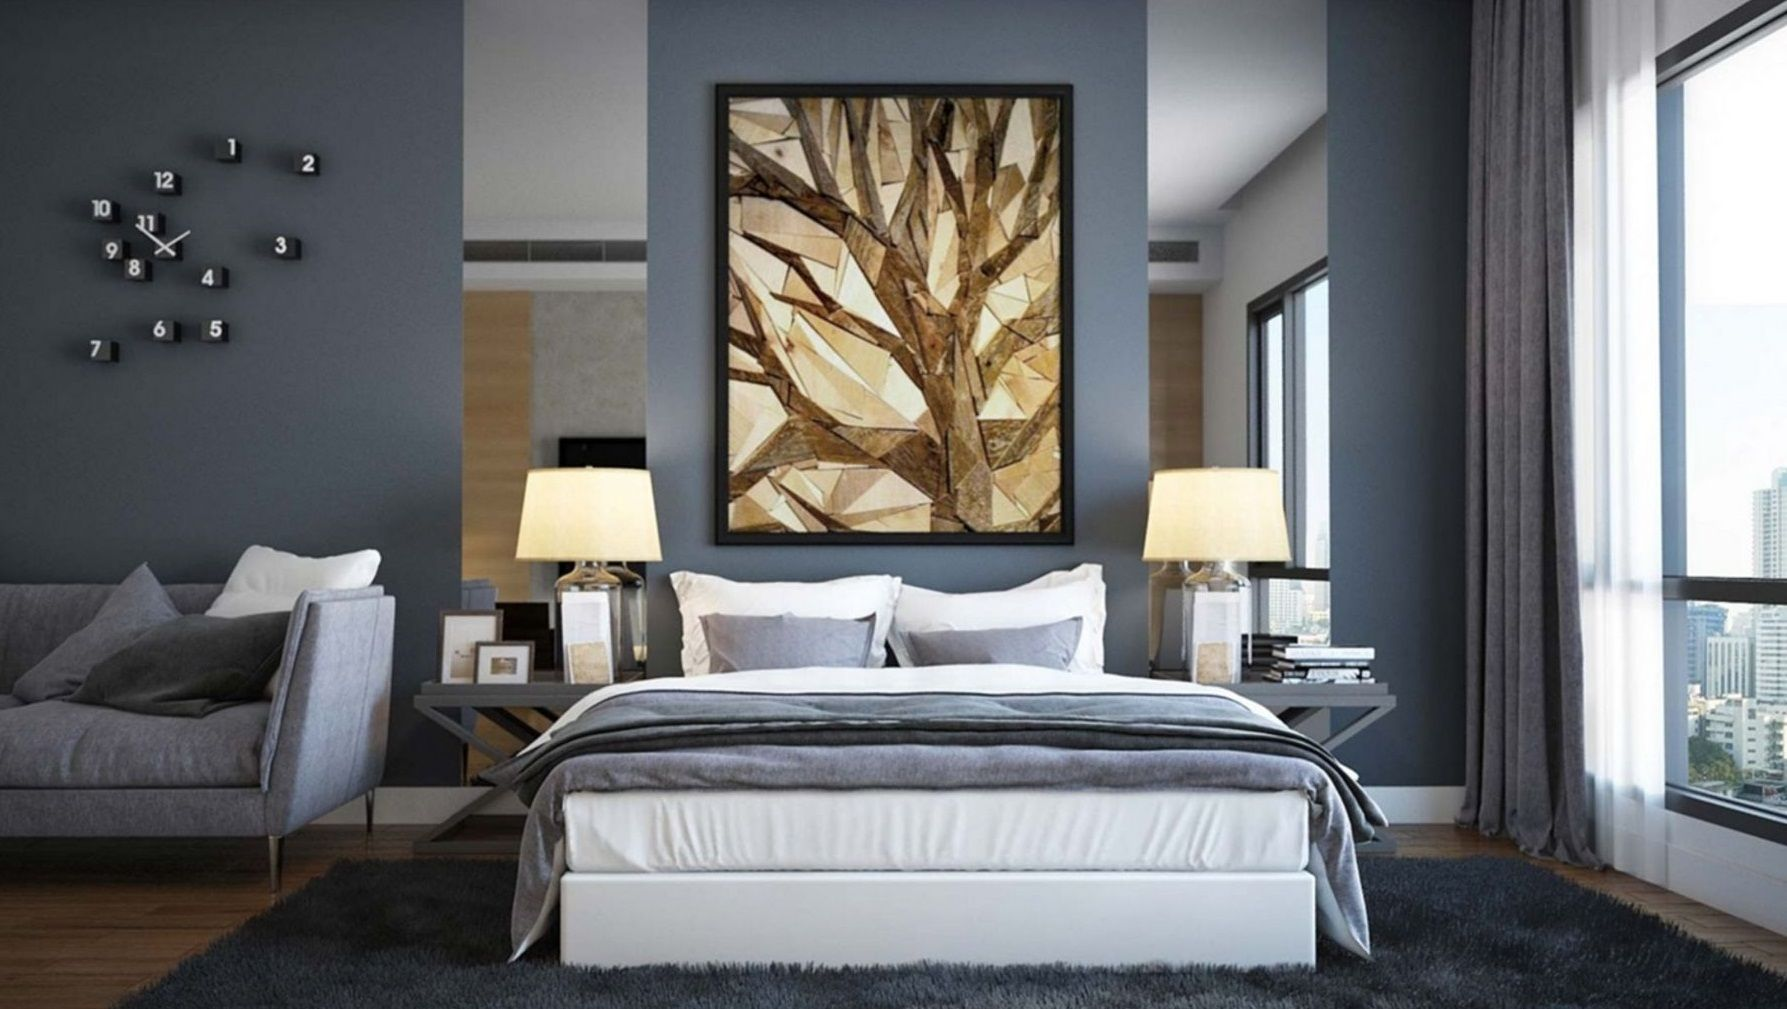 10 Astonishing Bedroom Design Ideas On A Budget Slate Blue Bedrooms Simple Bedroom Design Grey Bedroom Design